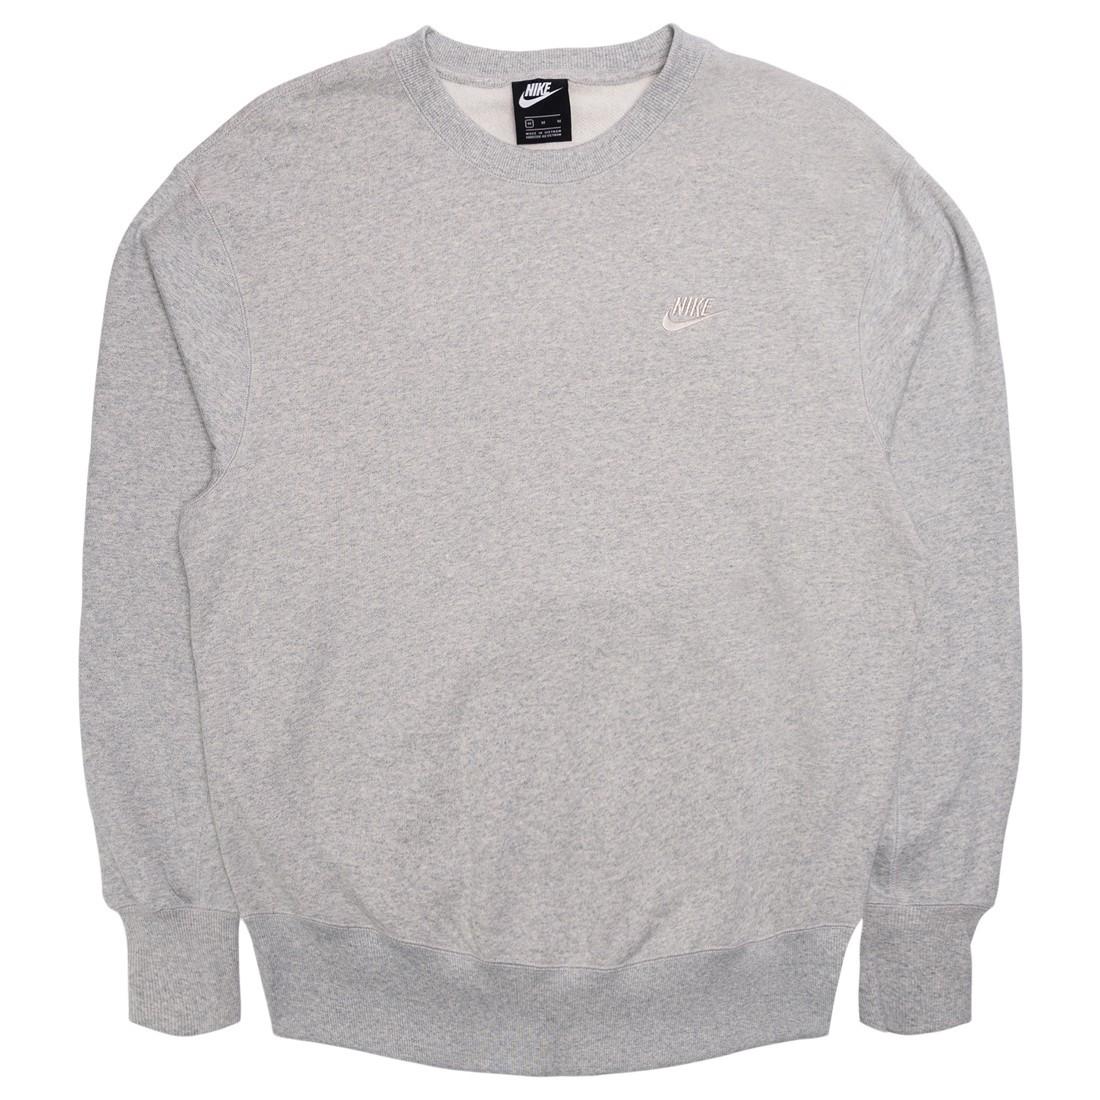 Nike Men Sportswear Crewneck (grey heather / light bone)